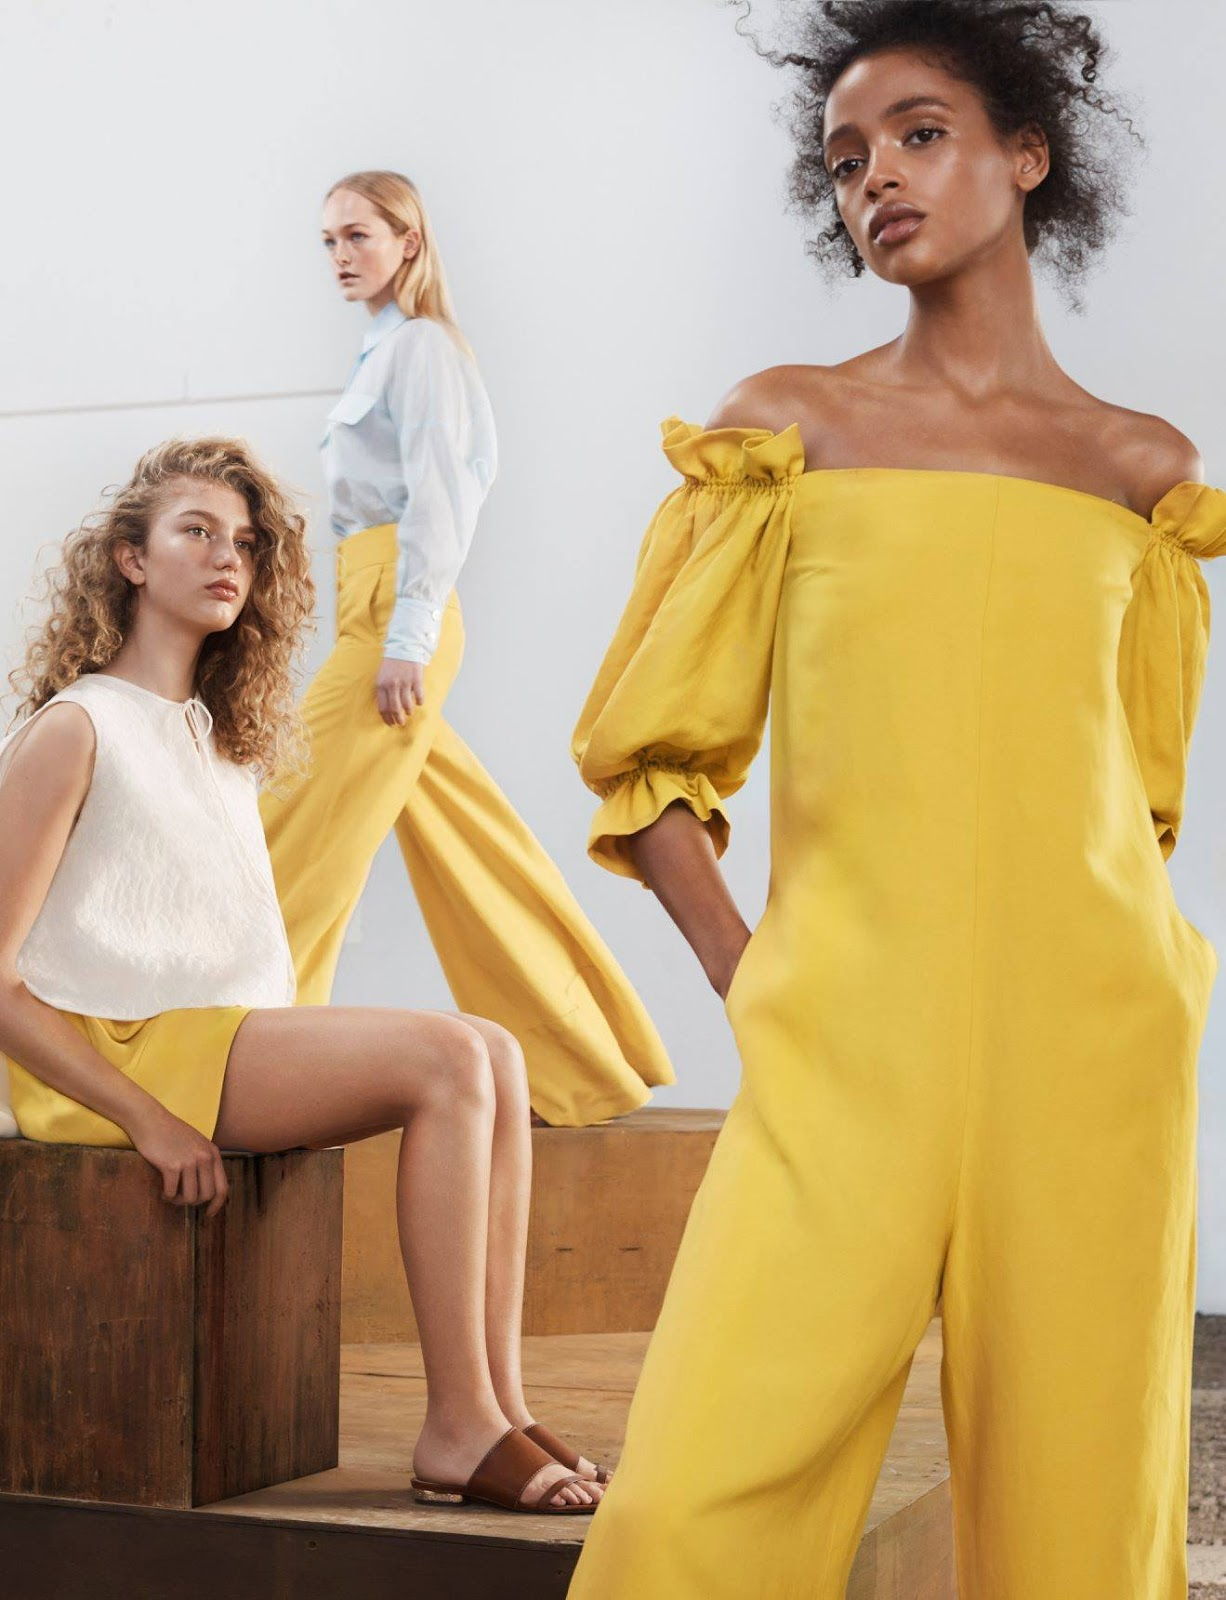 2018 Summer Dresses: Massimo Dutti Spring/Summer 2018 Campaign